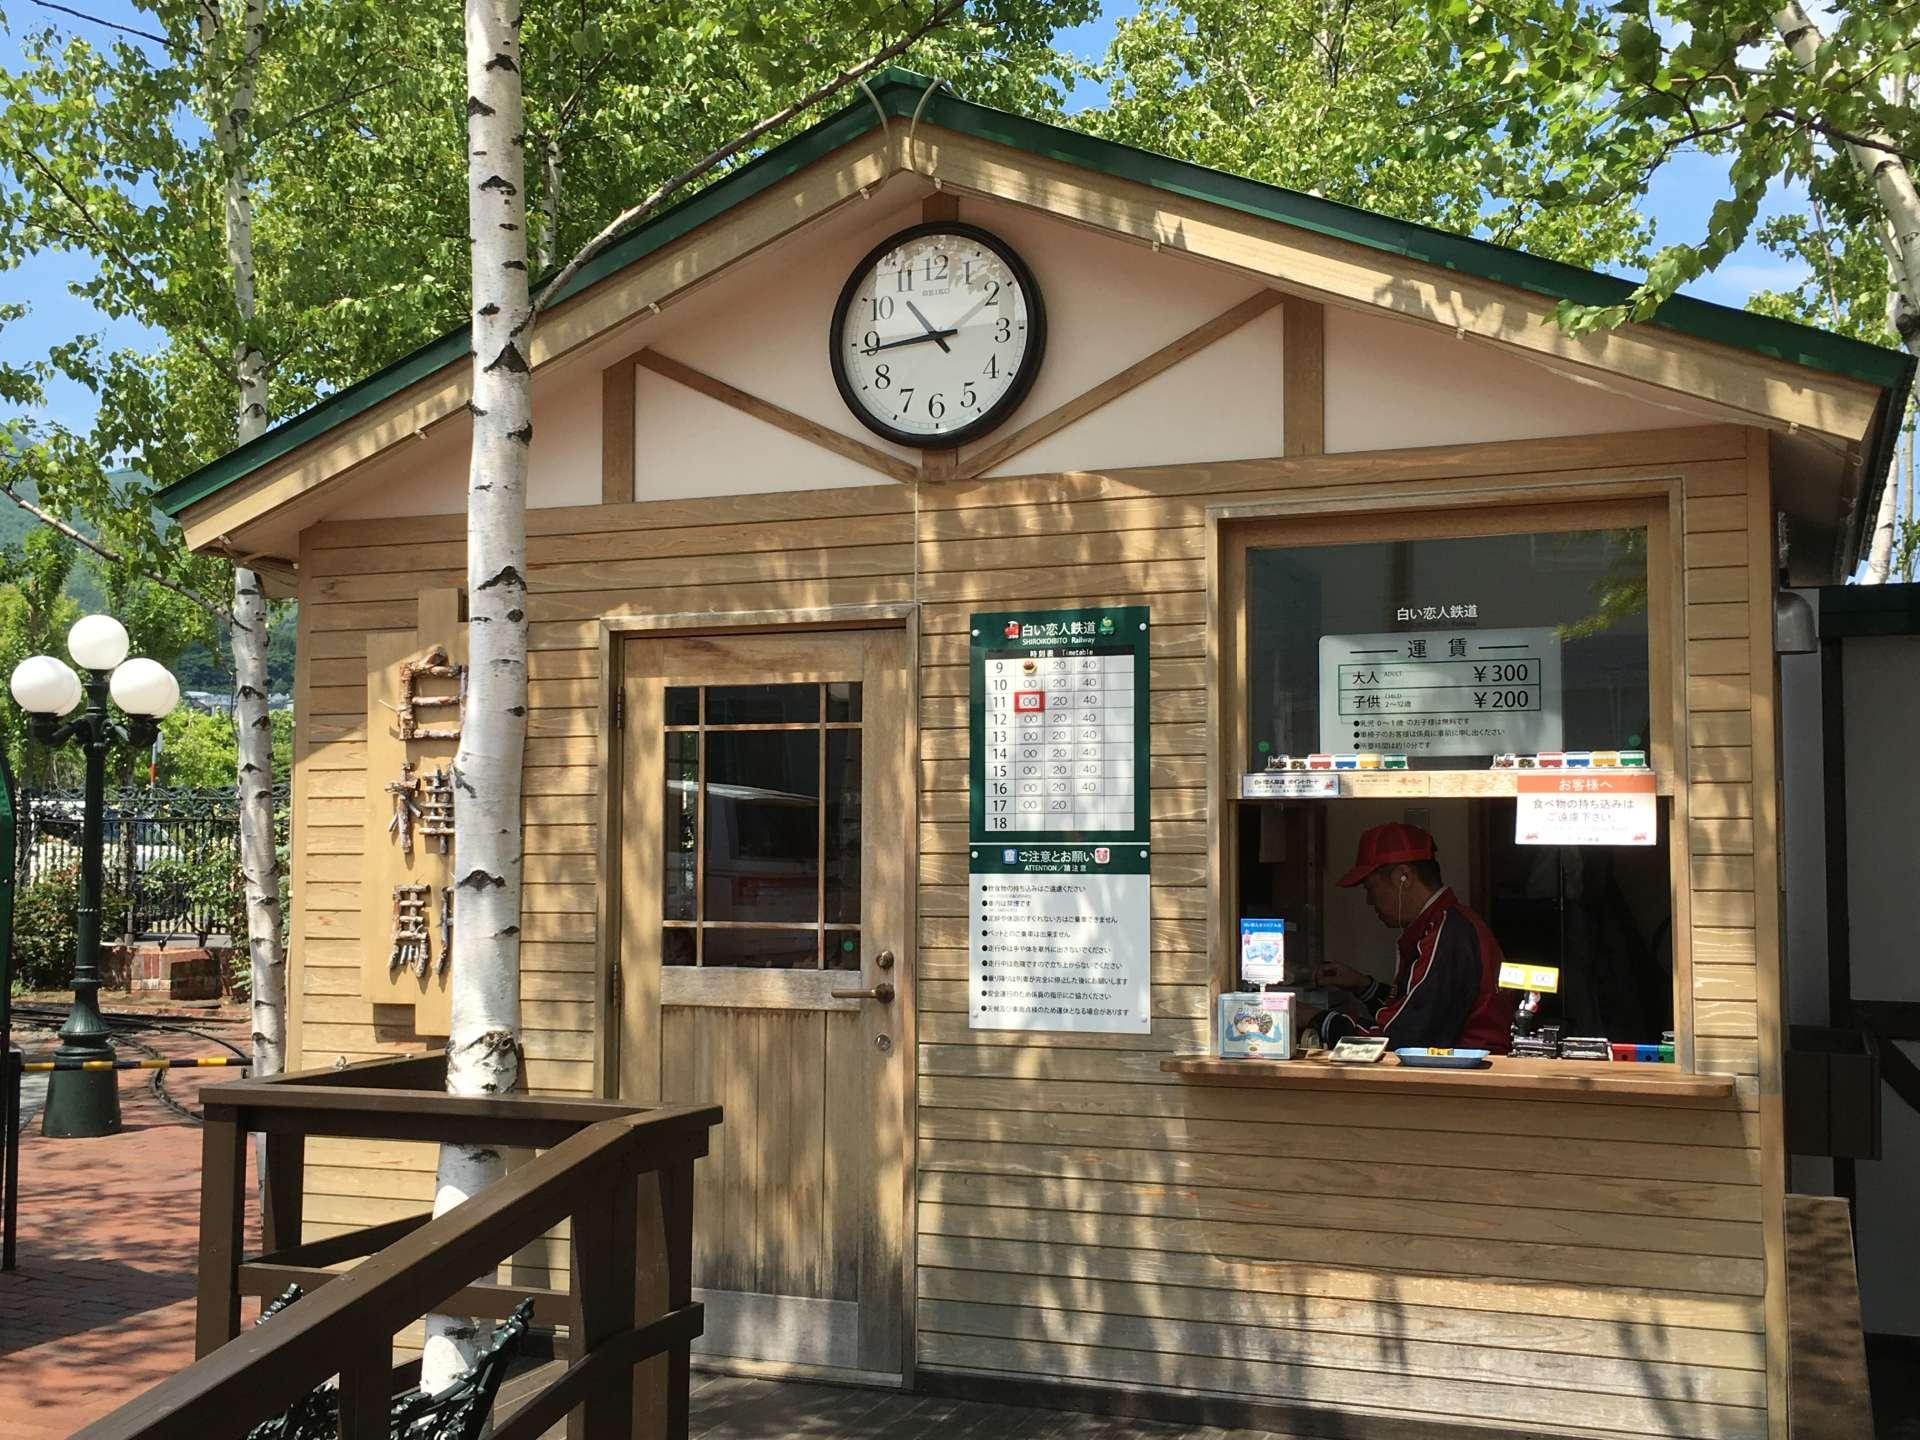 Shirakaba (White Birch) Station